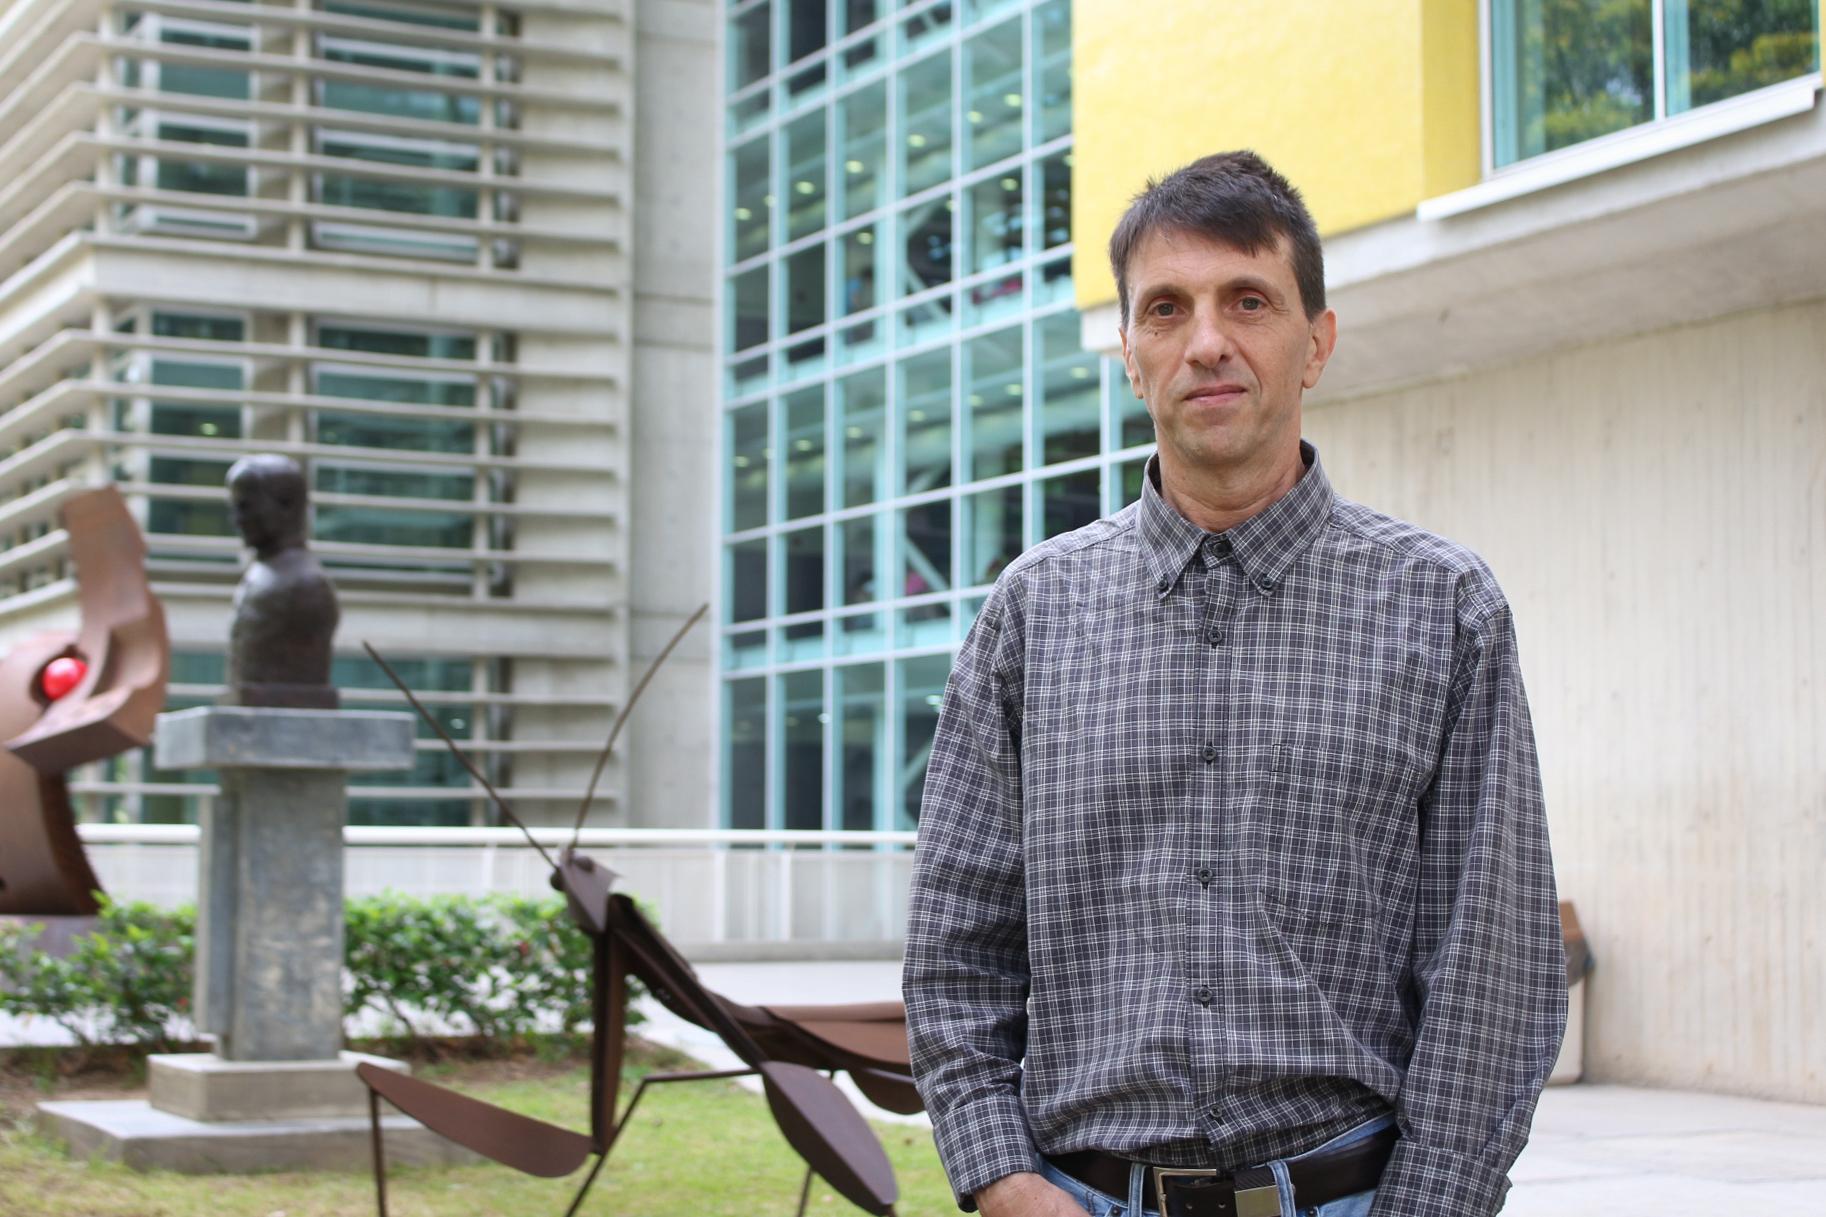 Profesores que inspiran: José Luis Jiménez